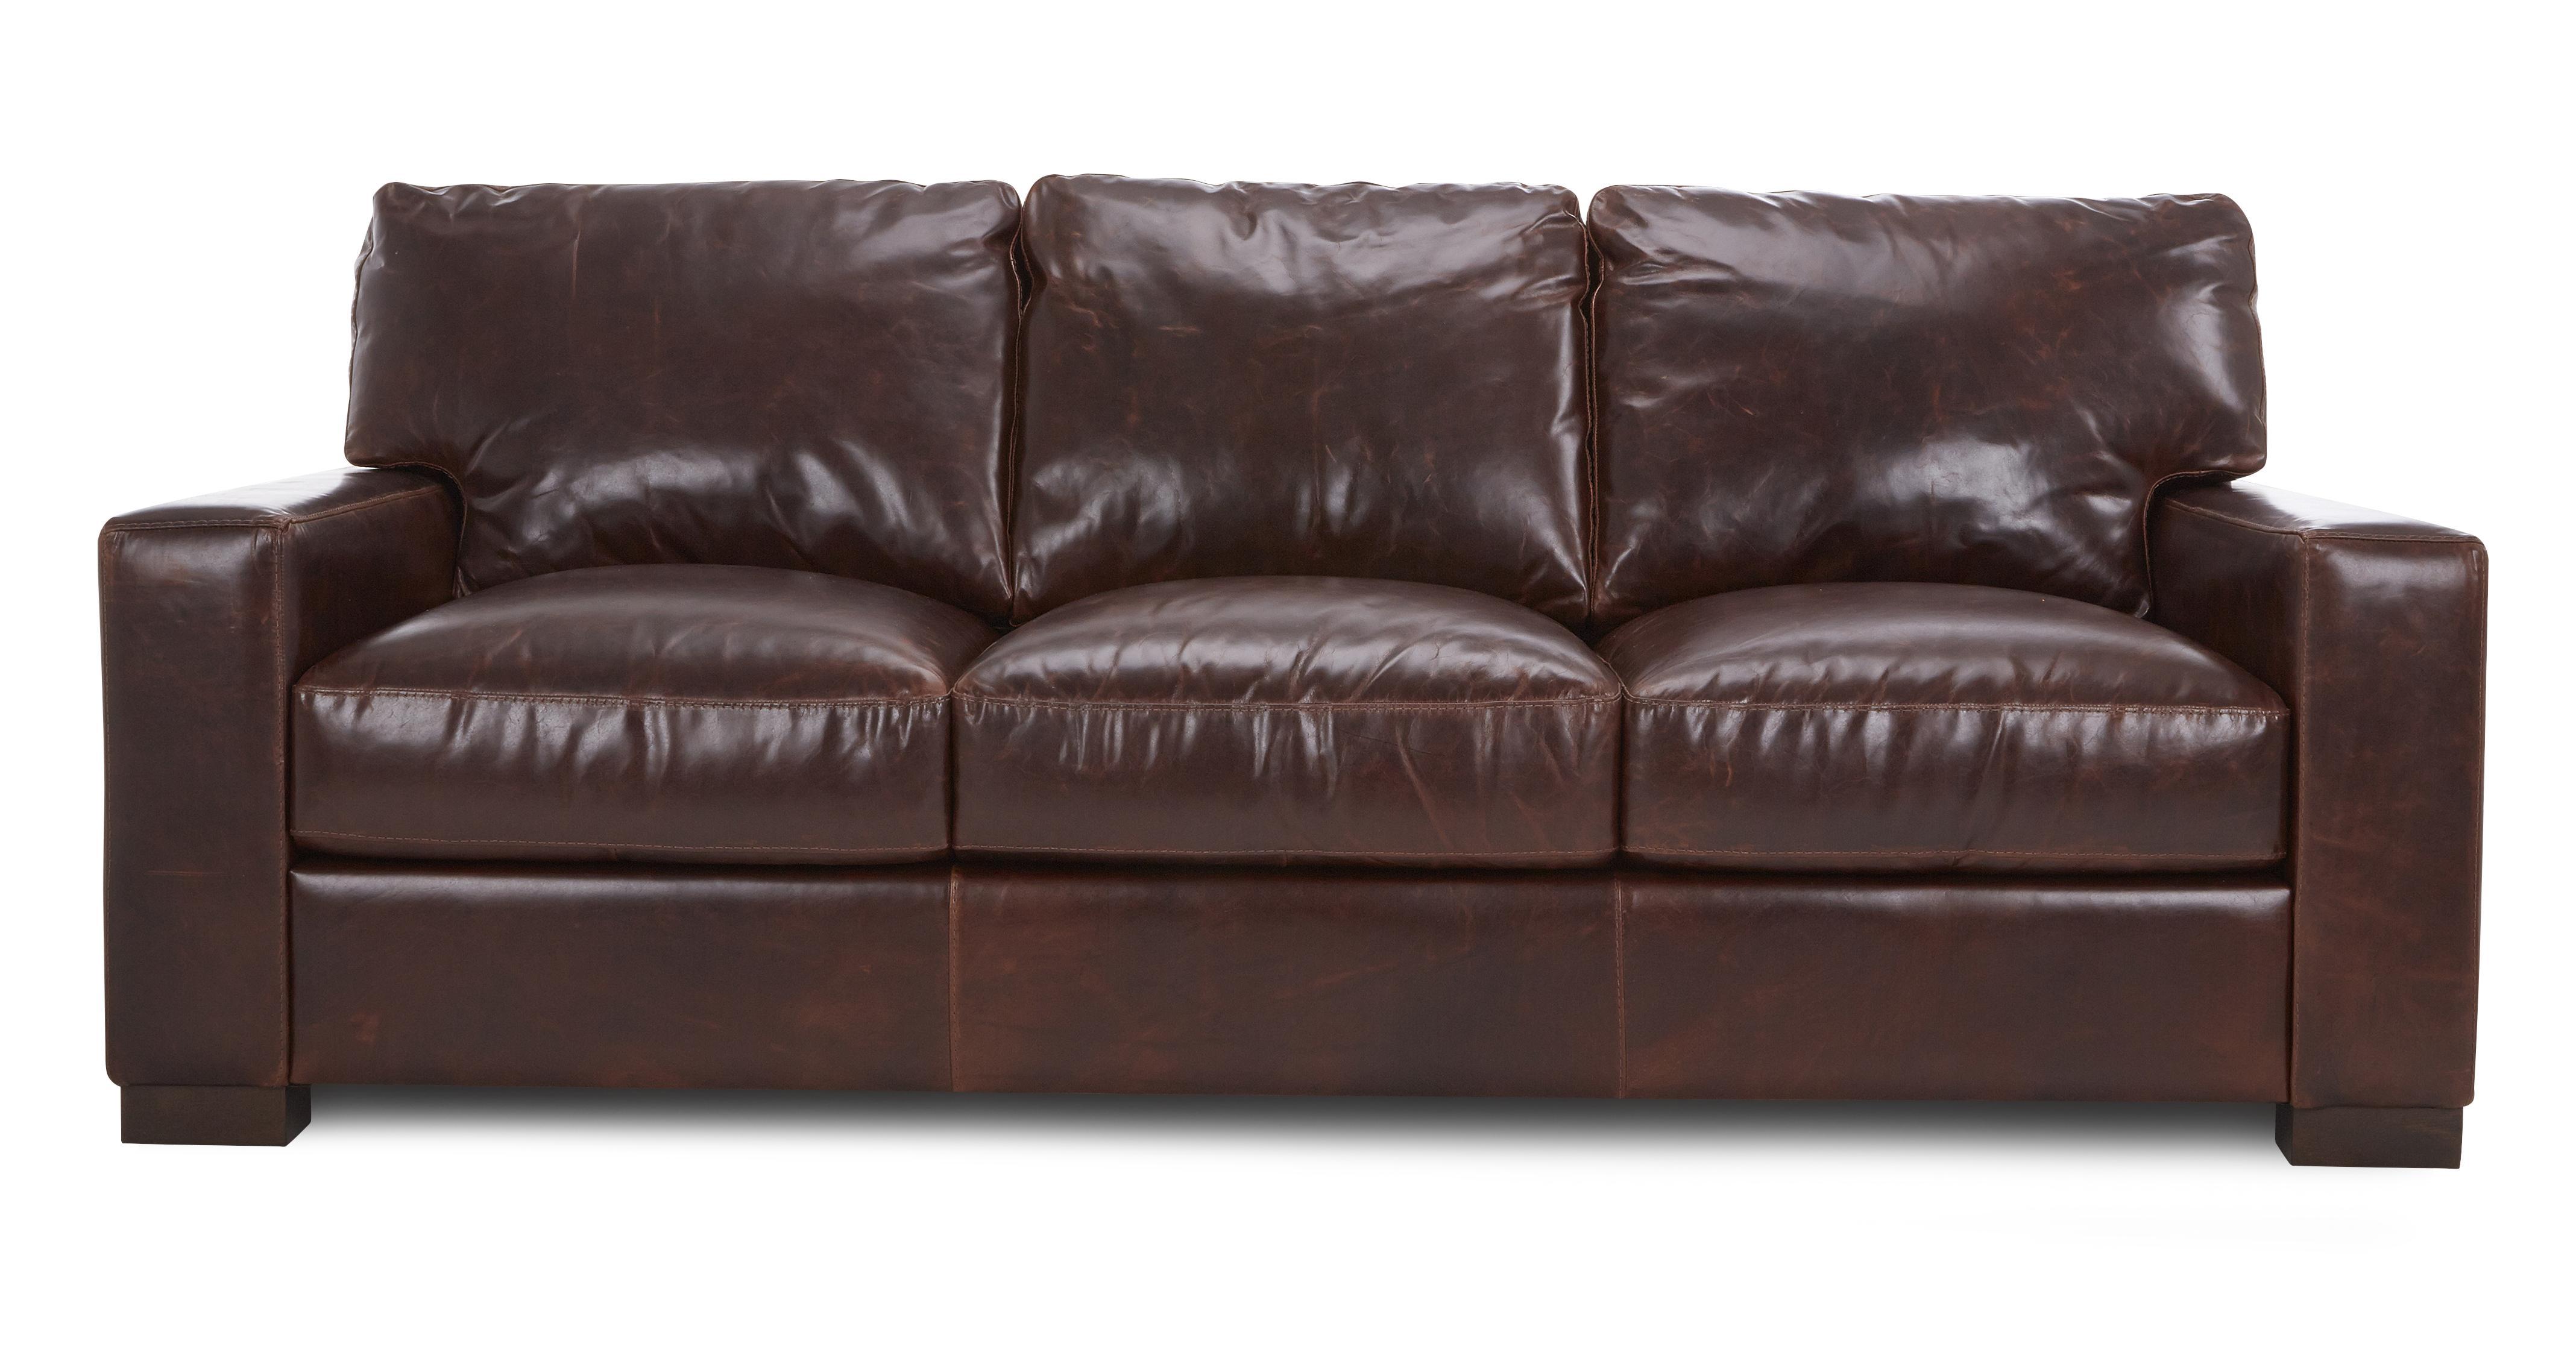 dfs brompton mahogany brown leather 3 seater sofa ebay